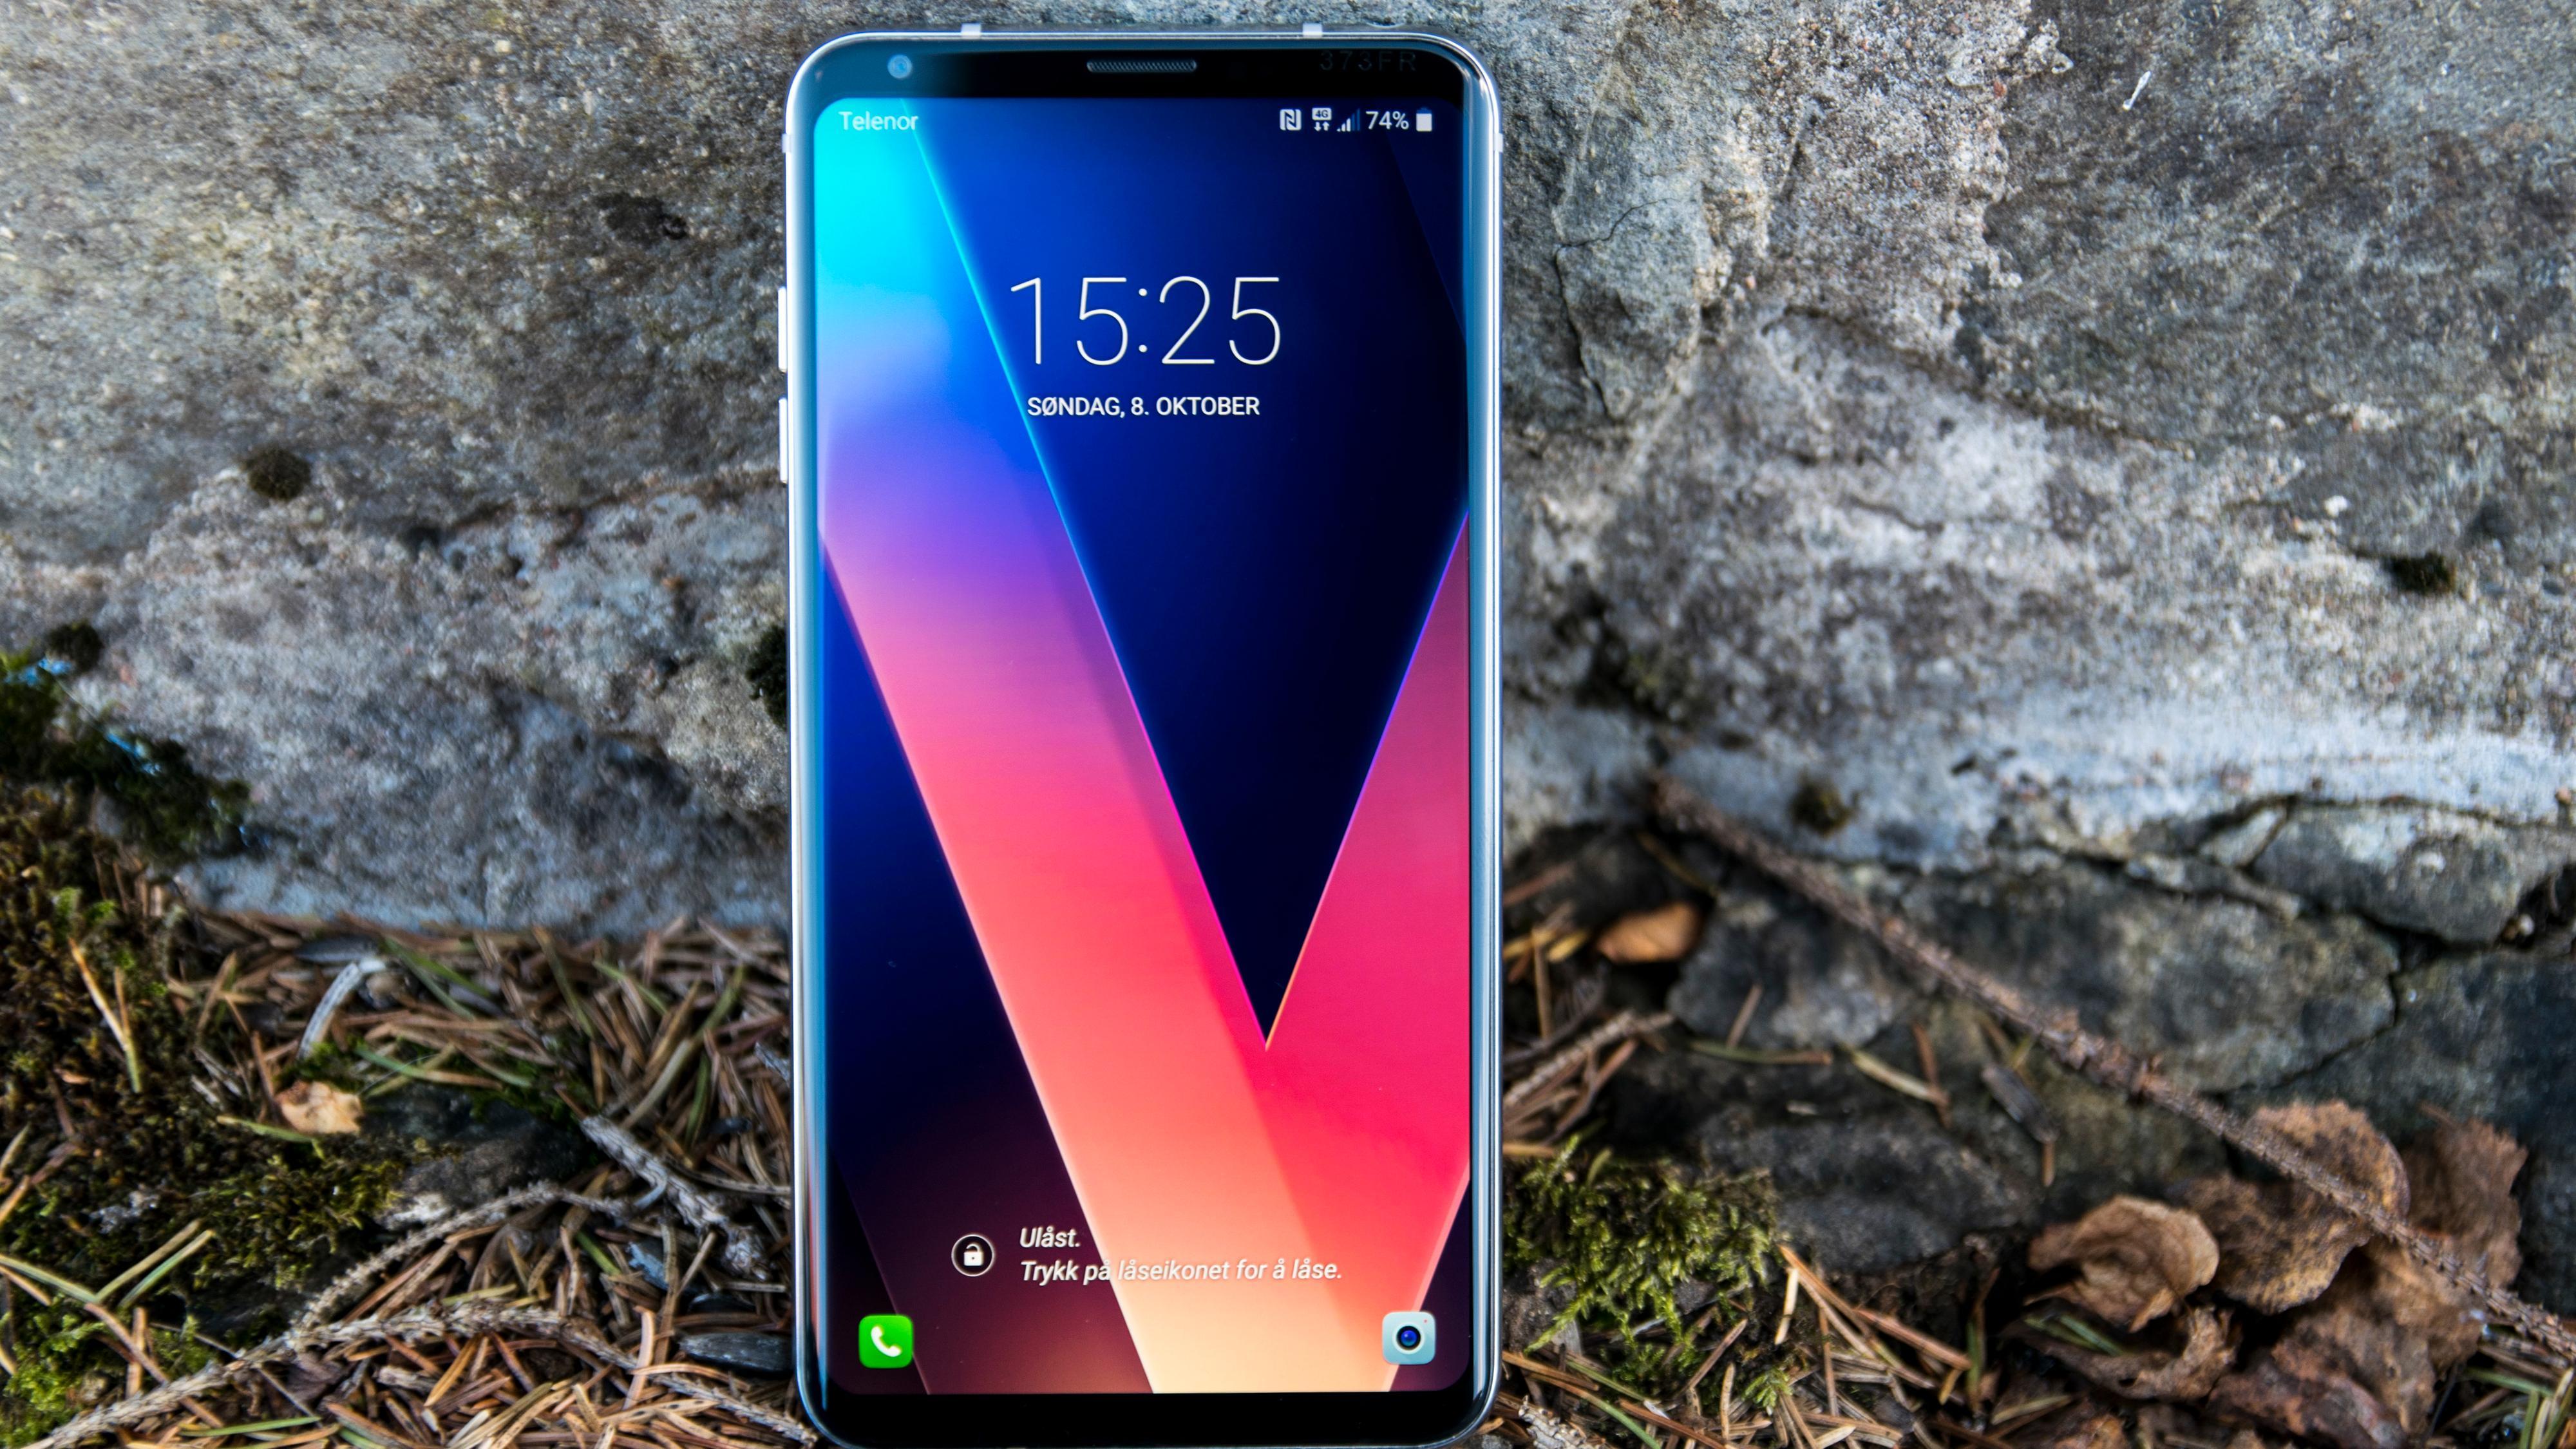 LG har akkurat vist frem sin nye toppmodell – LG V30s